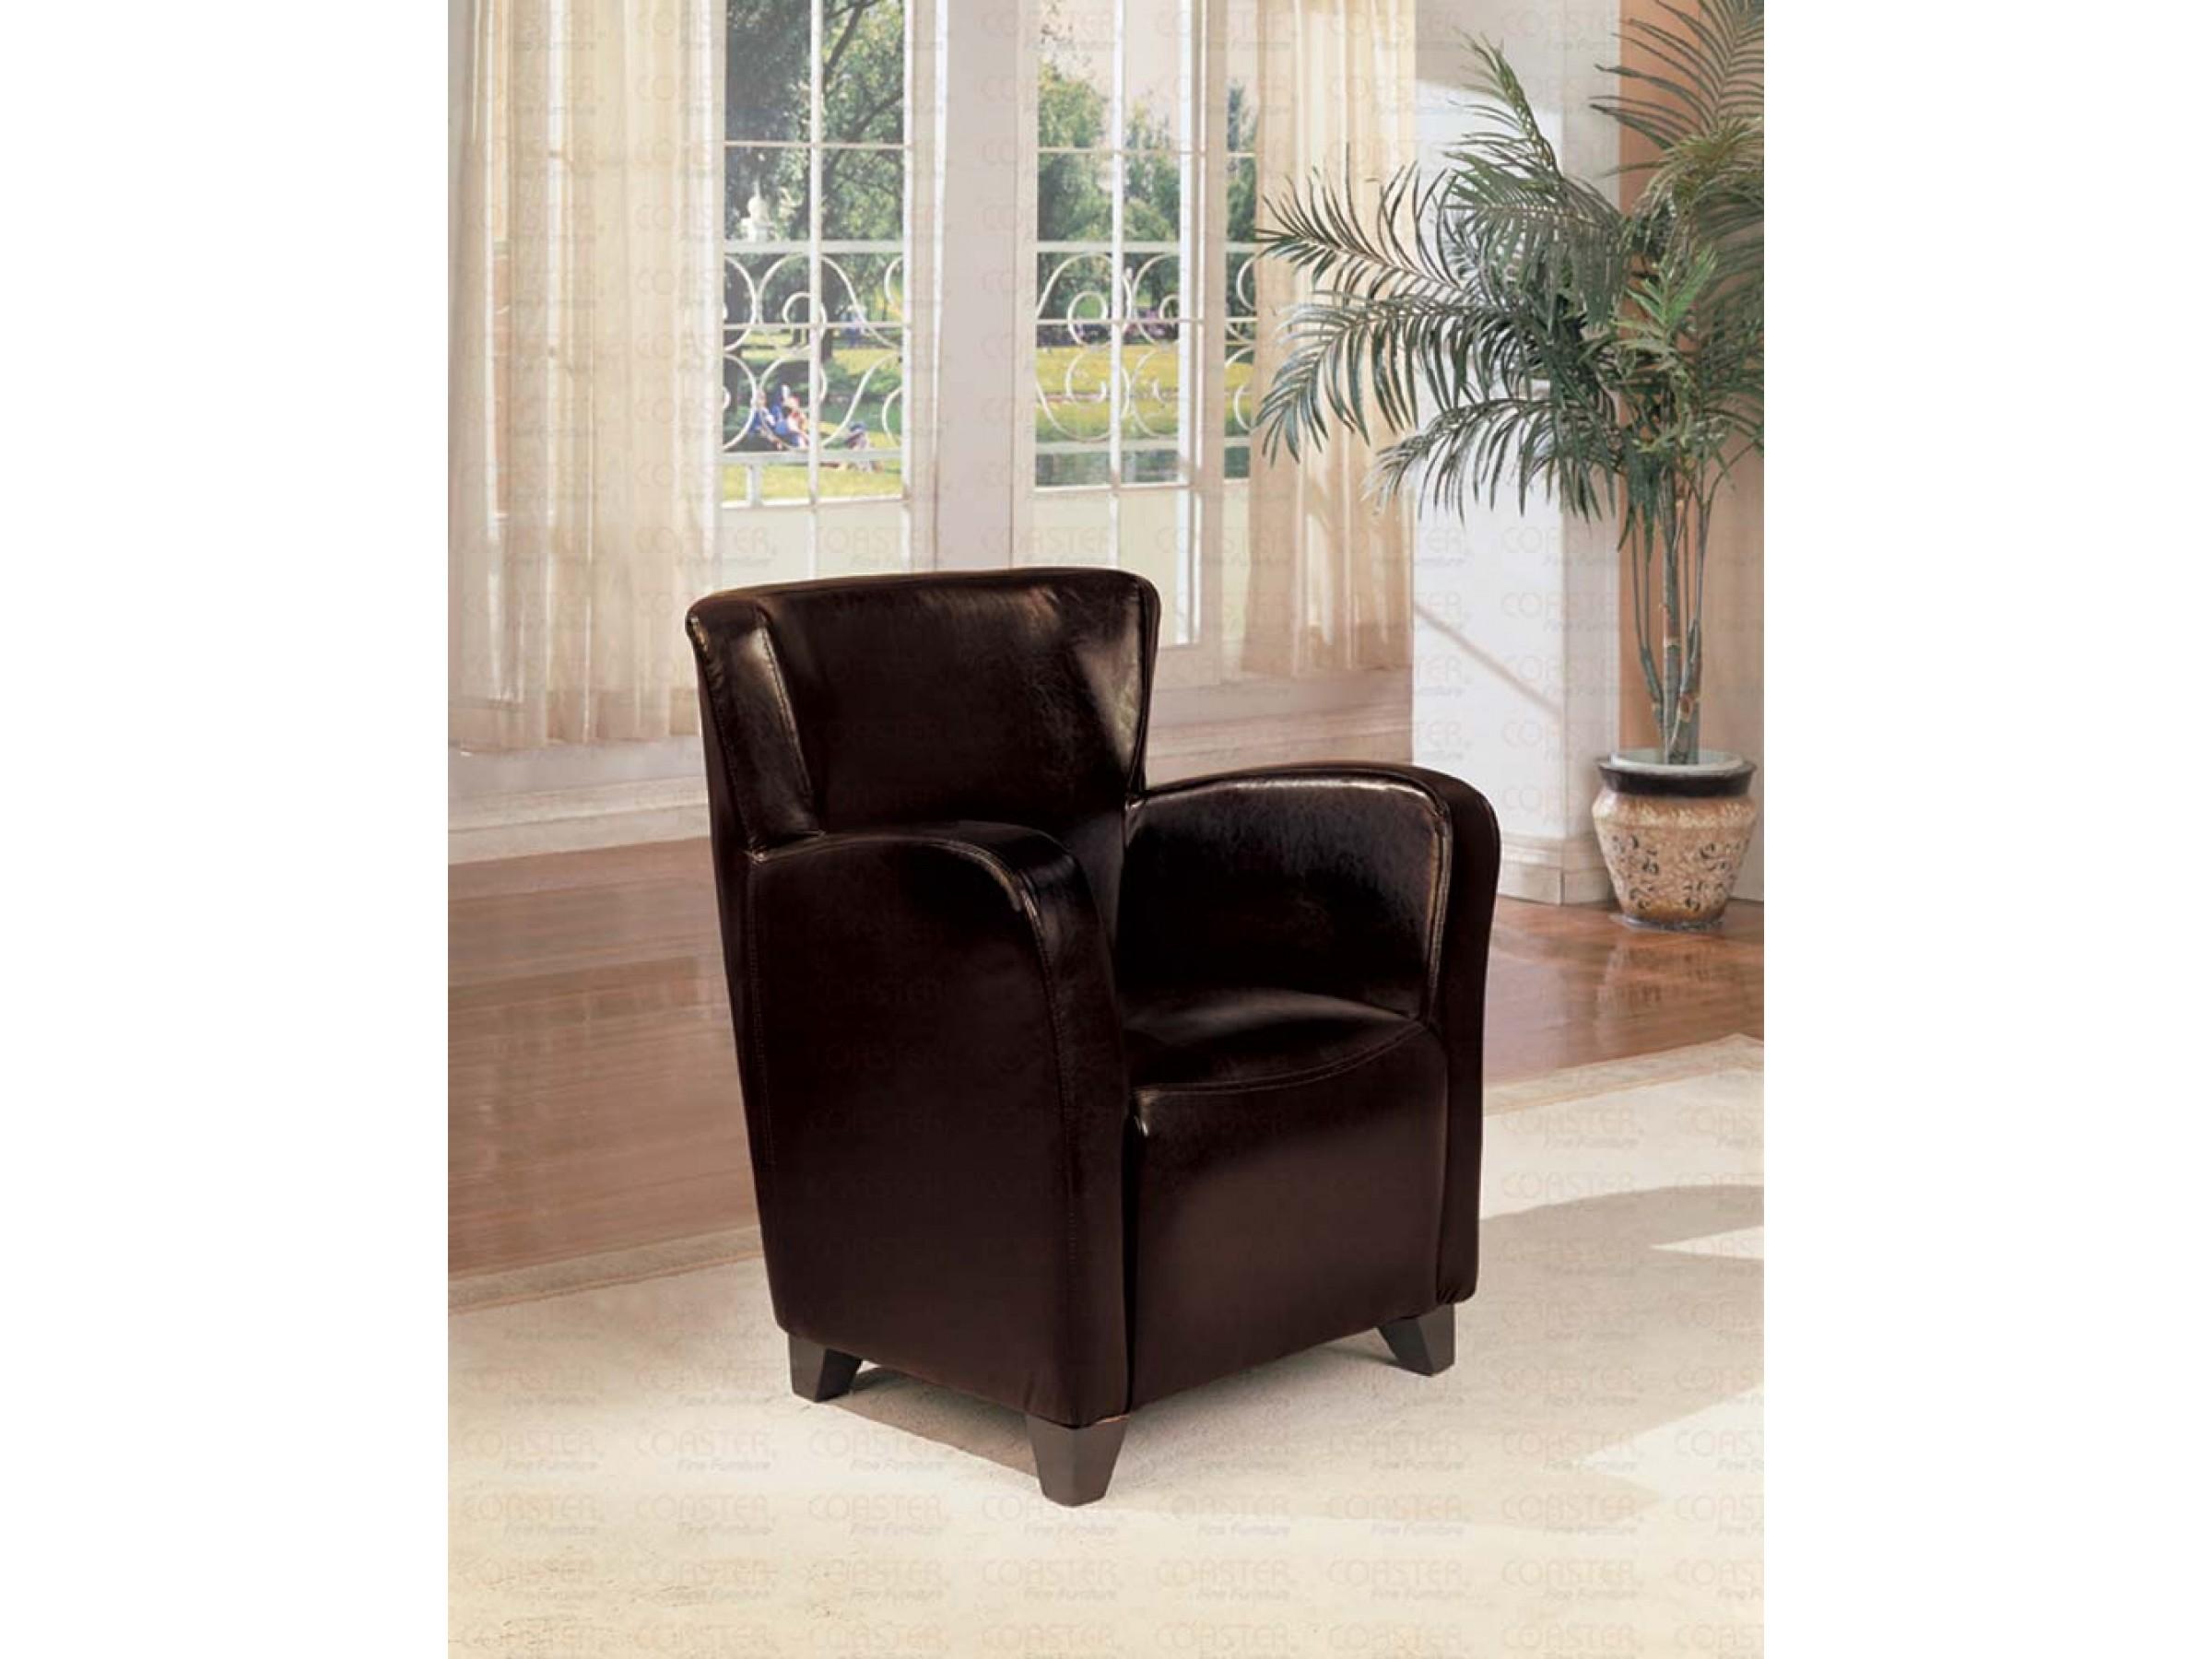 Wondrous Accent Chair Ibusinesslaw Wood Chair Design Ideas Ibusinesslaworg